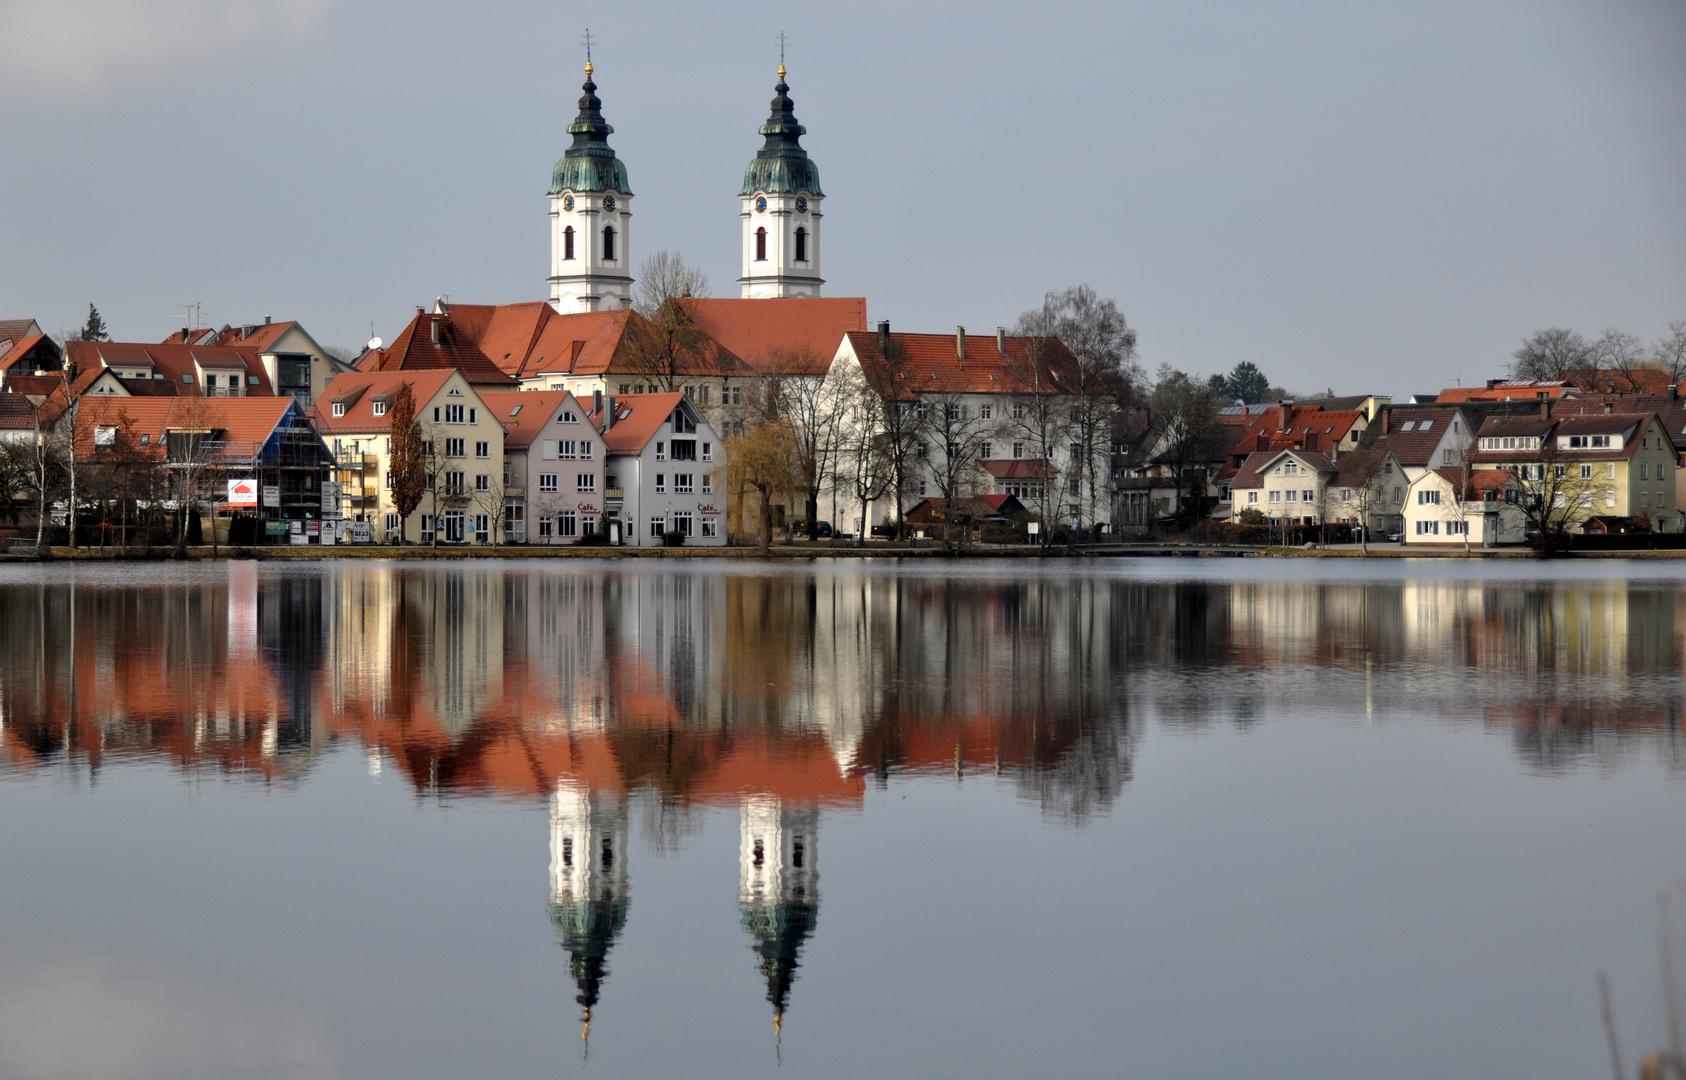 Bad Waldsee Stadt mit St. Peter / kath. Kirche